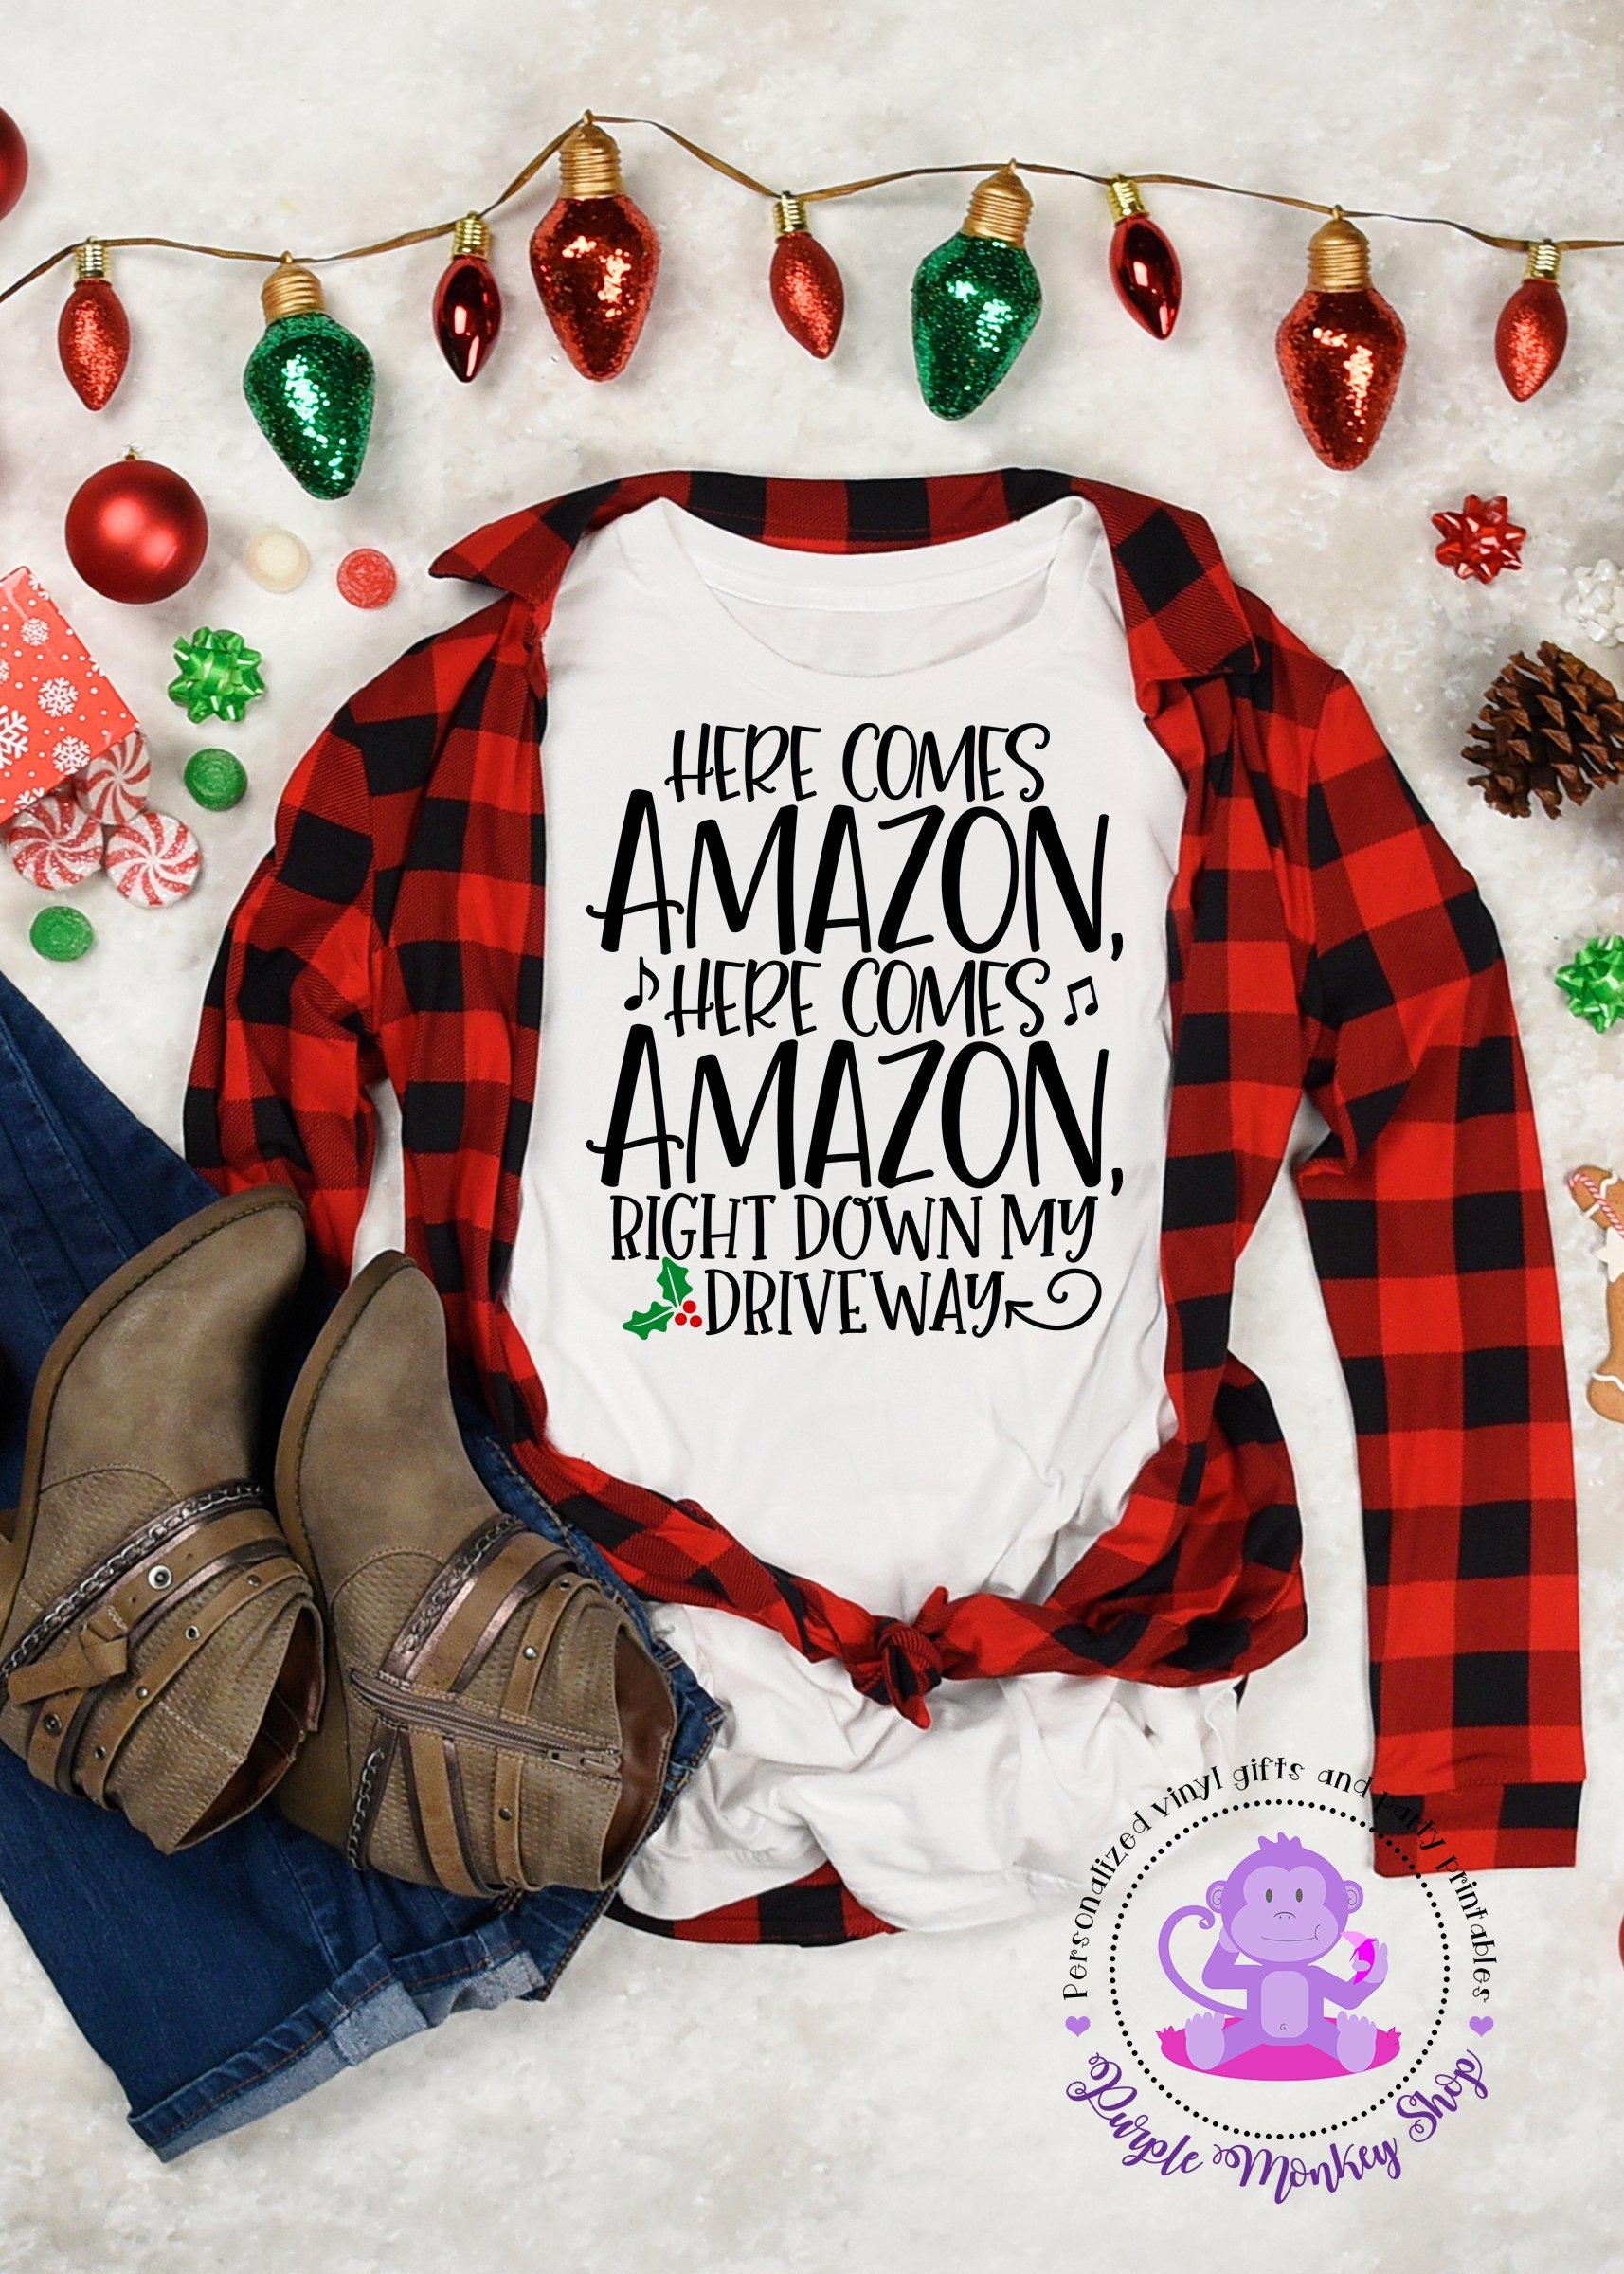 Here Comes Amazon Here Comes Amazon Right Down My